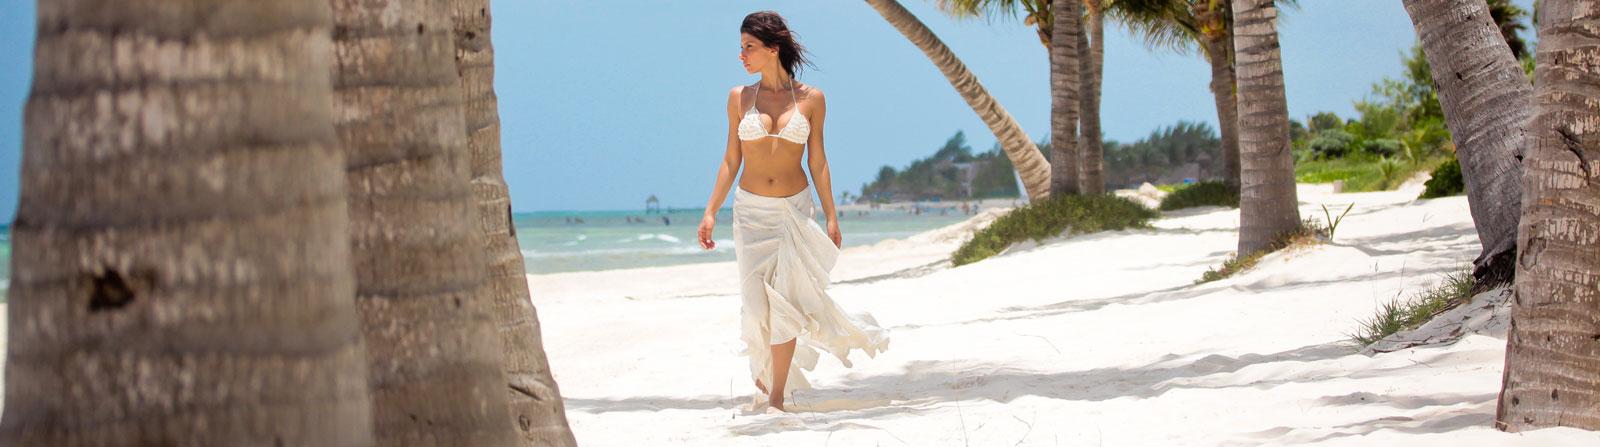 Praia próxima ao Grand Velas Riviera Maya México